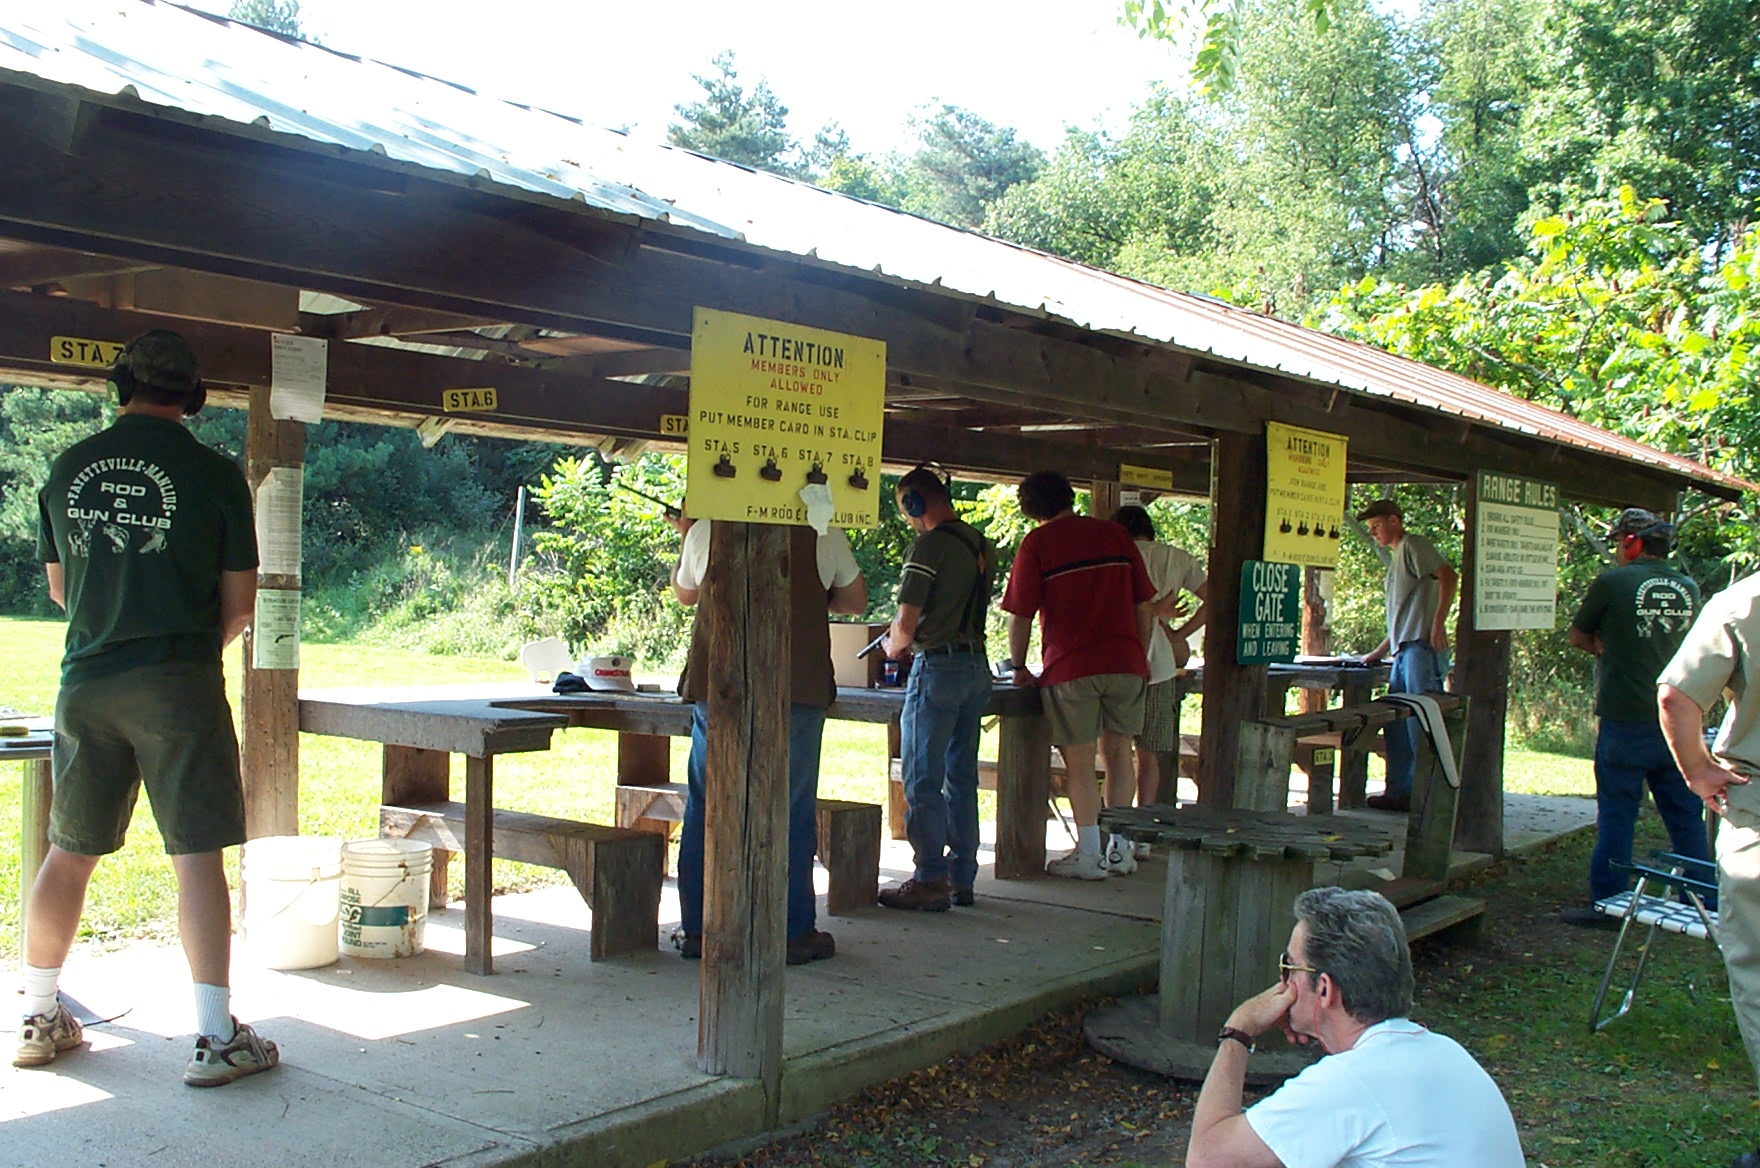 nys pistol permit recertification application